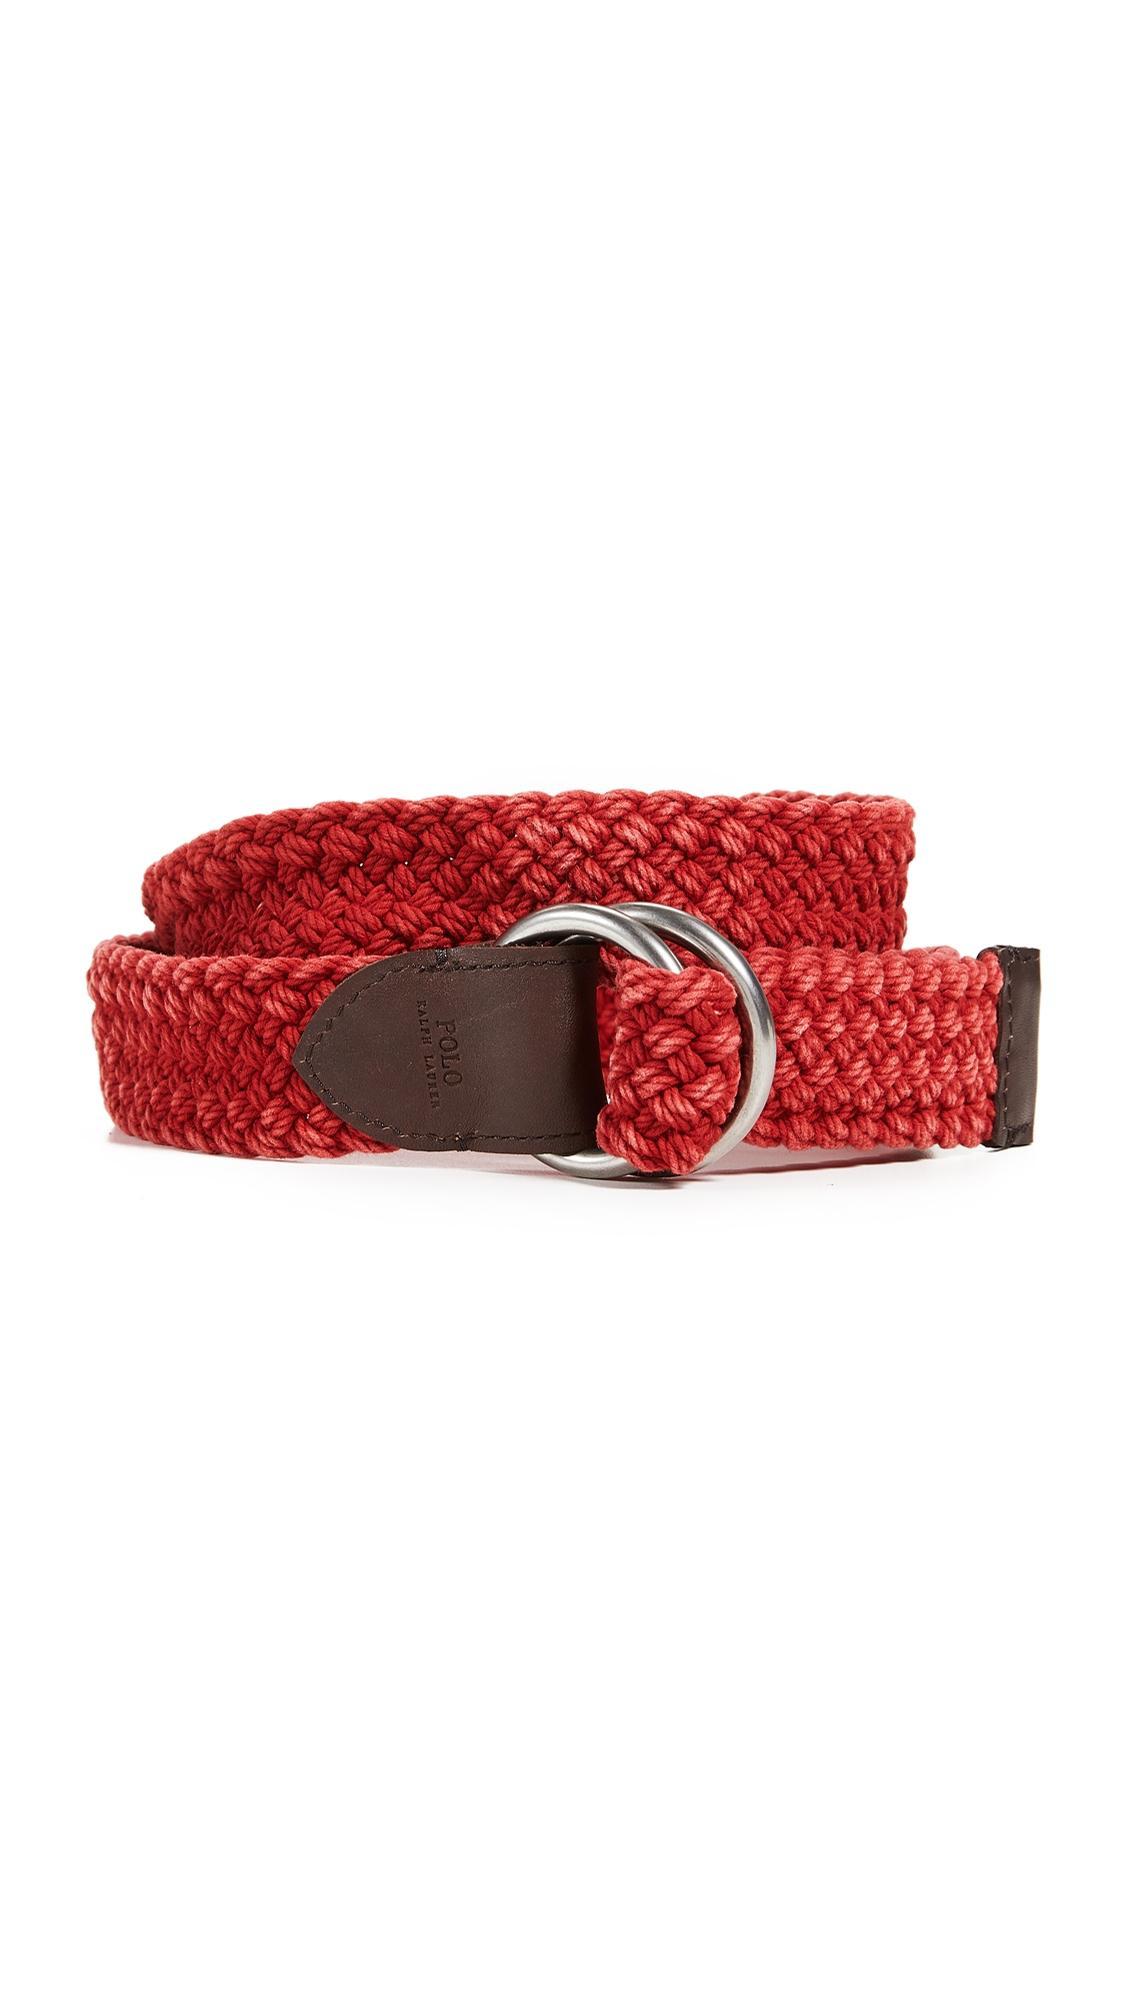 Polo Ralph Lauren Braided Belt In Red